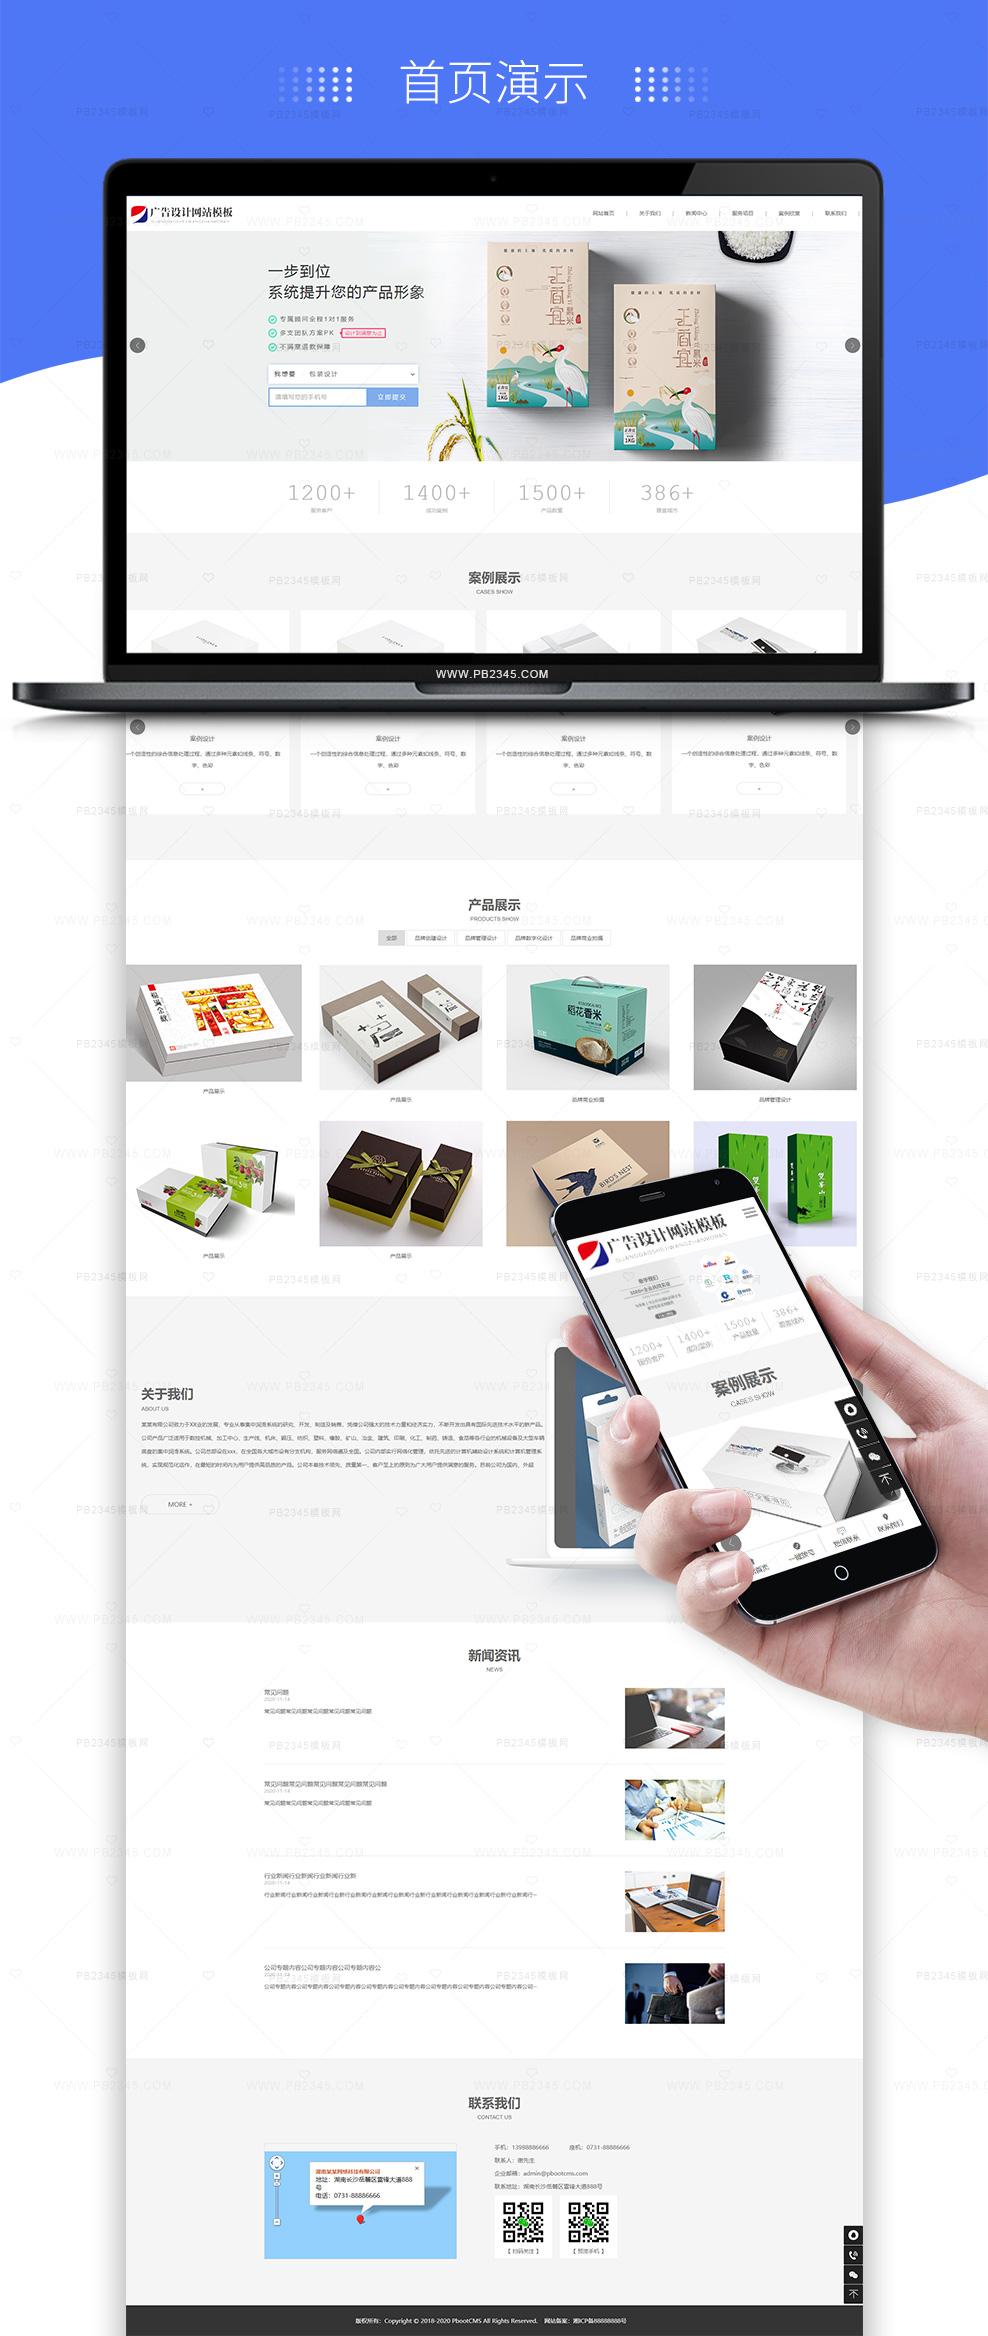 pbootcms大气响应式广告设计类网站源码模板